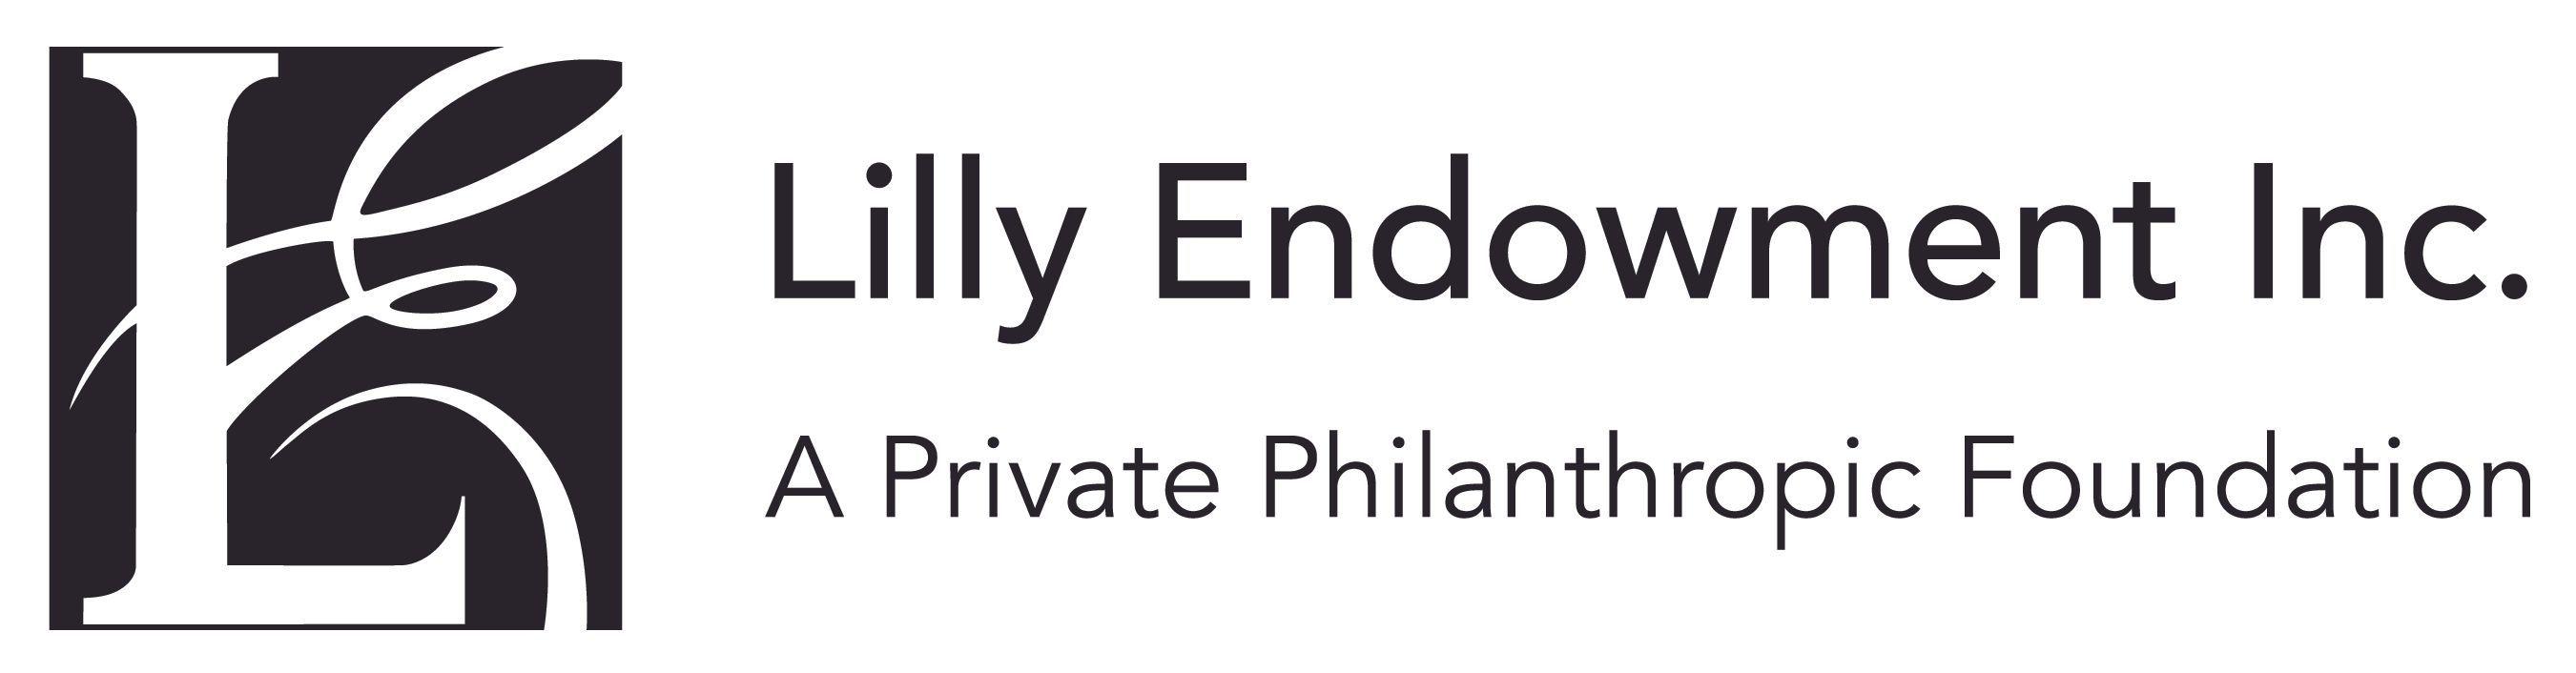 Lilly Endowment Logo - 5-15-21